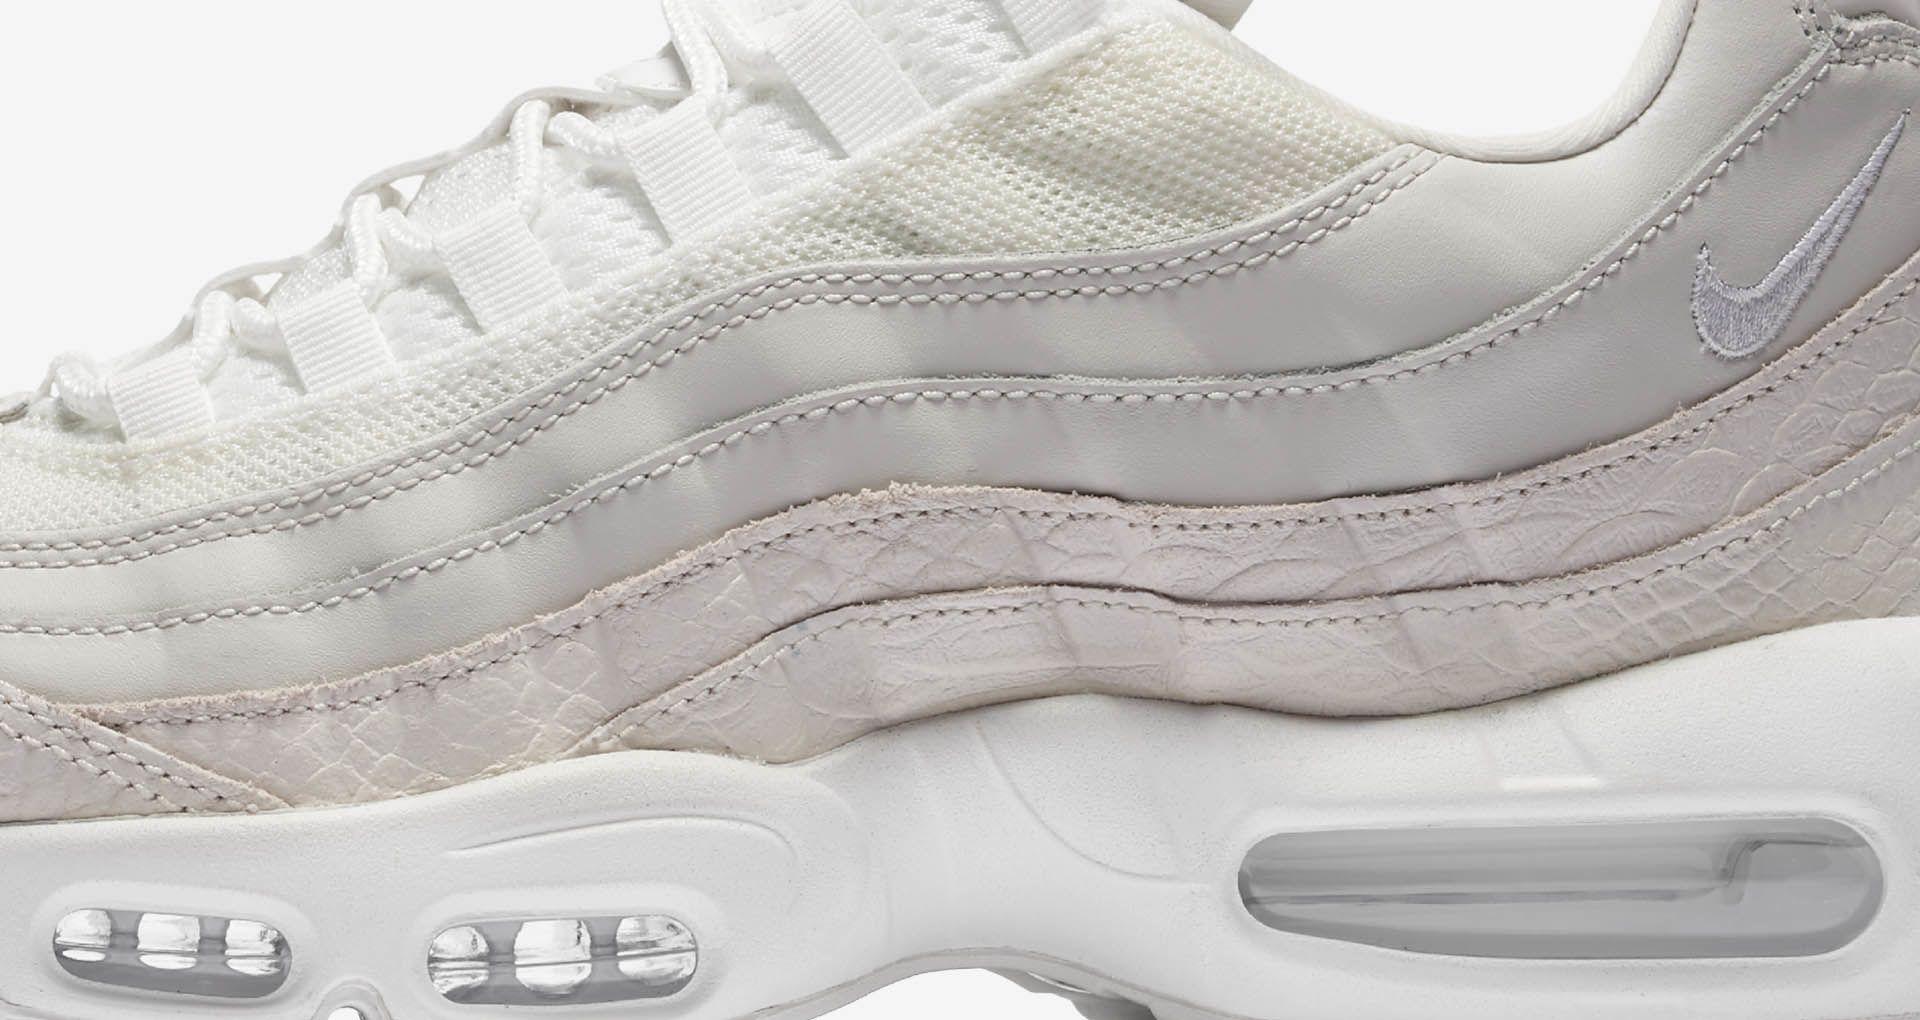 04ae20e302 Nike Air Max 95 Premium 'Summit White' Release Date. Nike+ SNKRS